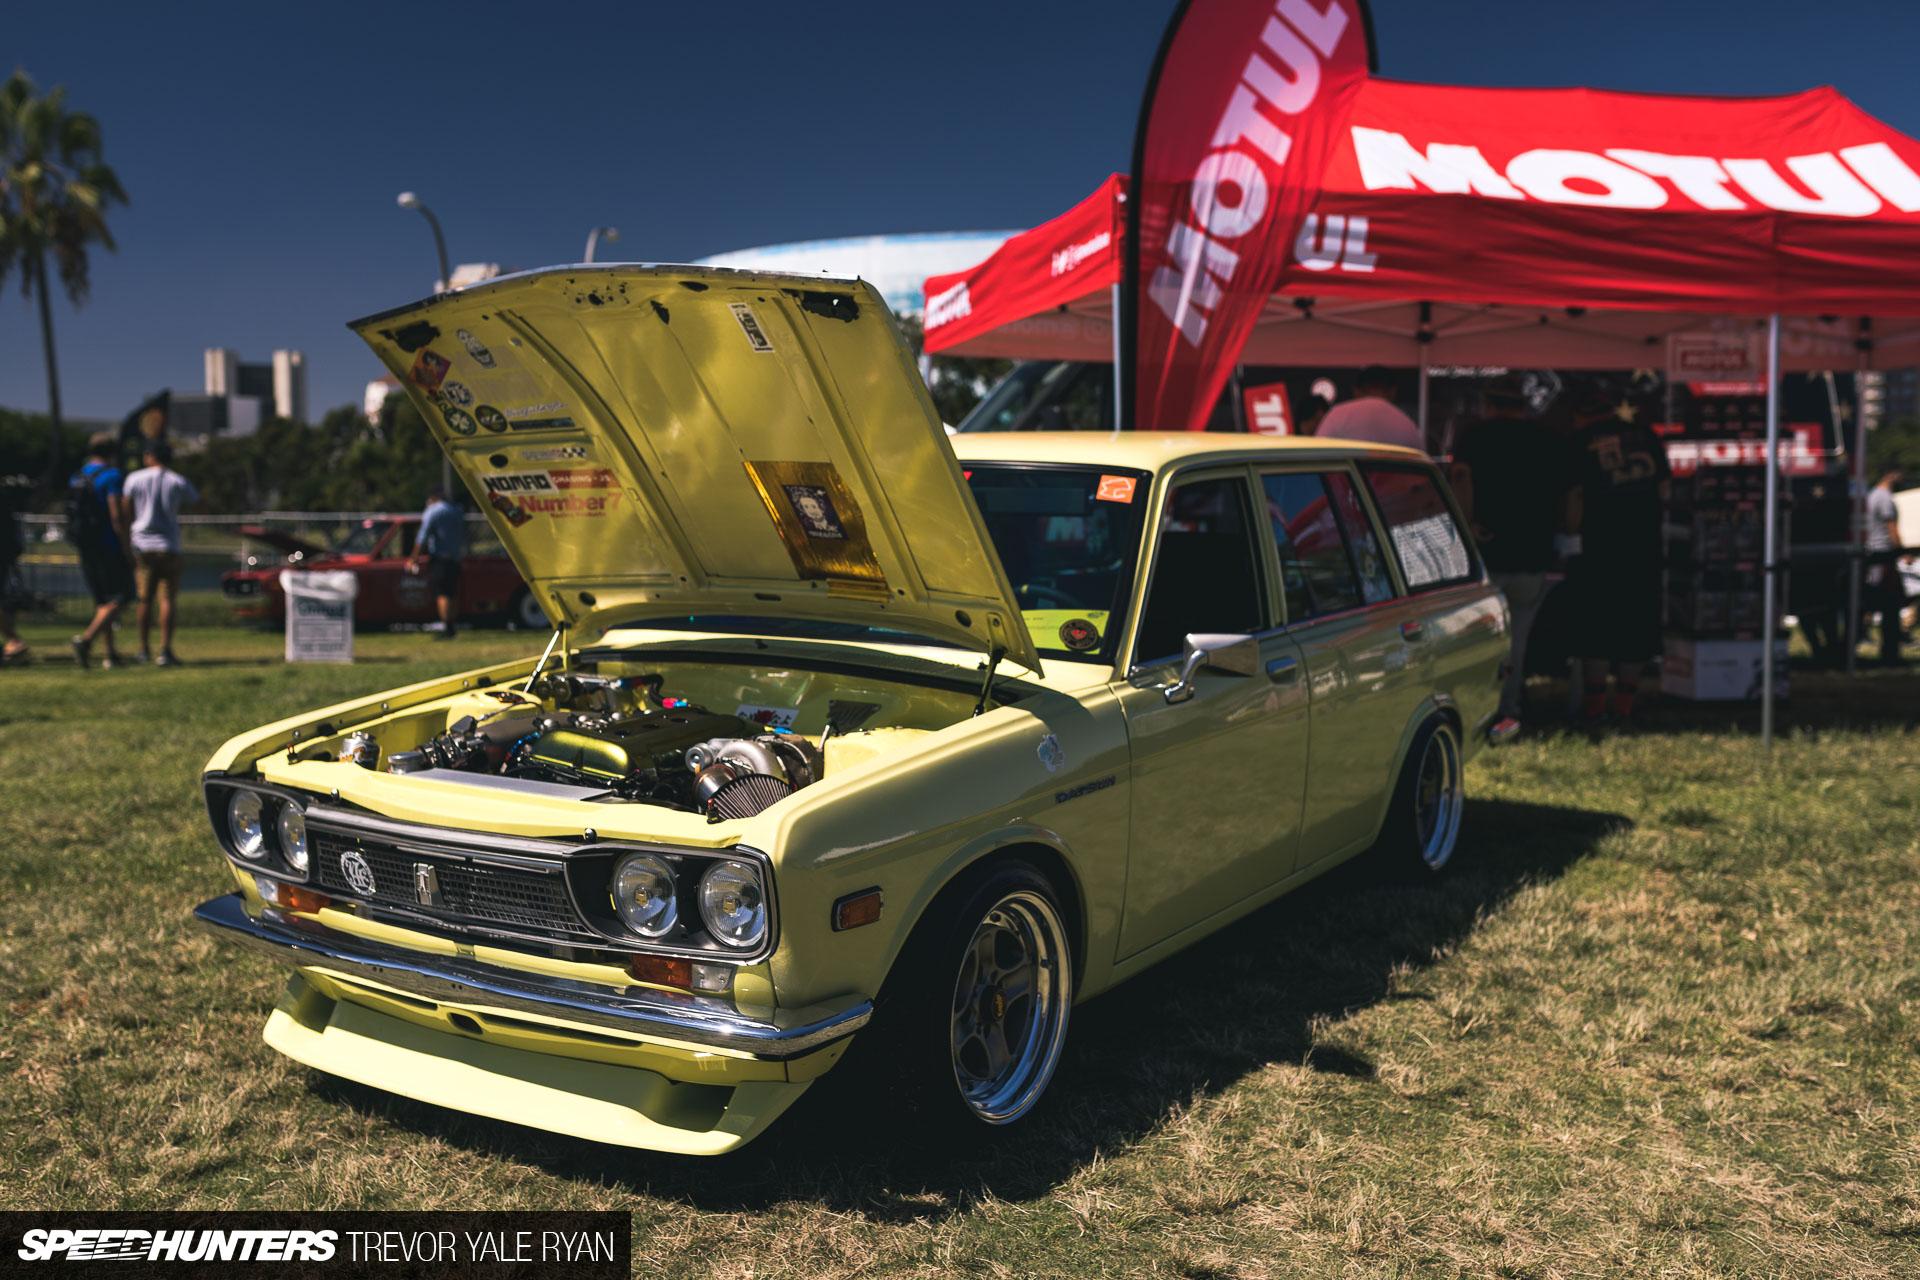 A Lap At Americas Biggest Japanese Classic Car Show News - Japanese classic car show